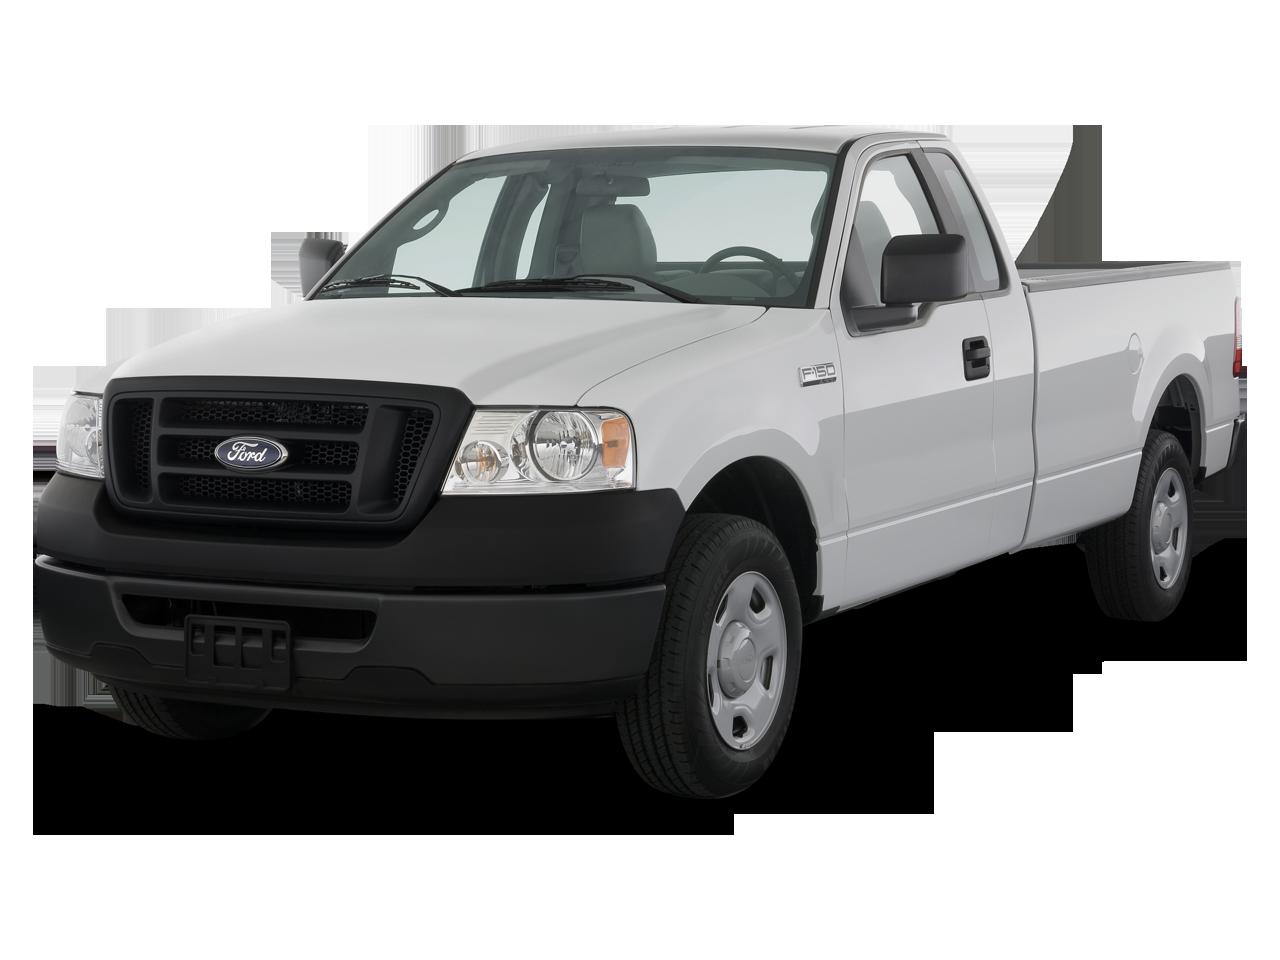 lp powered 2008 ford f150 roush truck fuel efficient. Black Bedroom Furniture Sets. Home Design Ideas